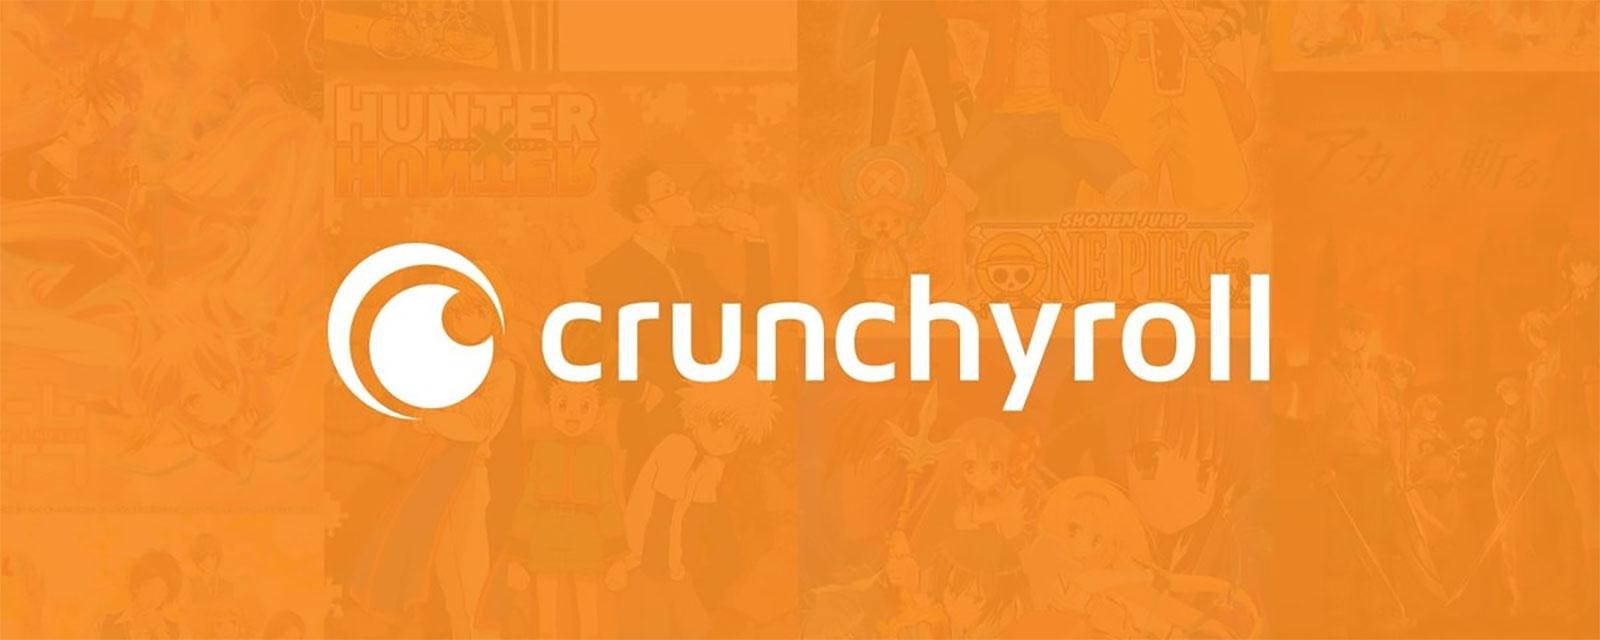 Crunchyroll Premium Mod Apk 2.6.0 (Pro Unlocked) Download For Android